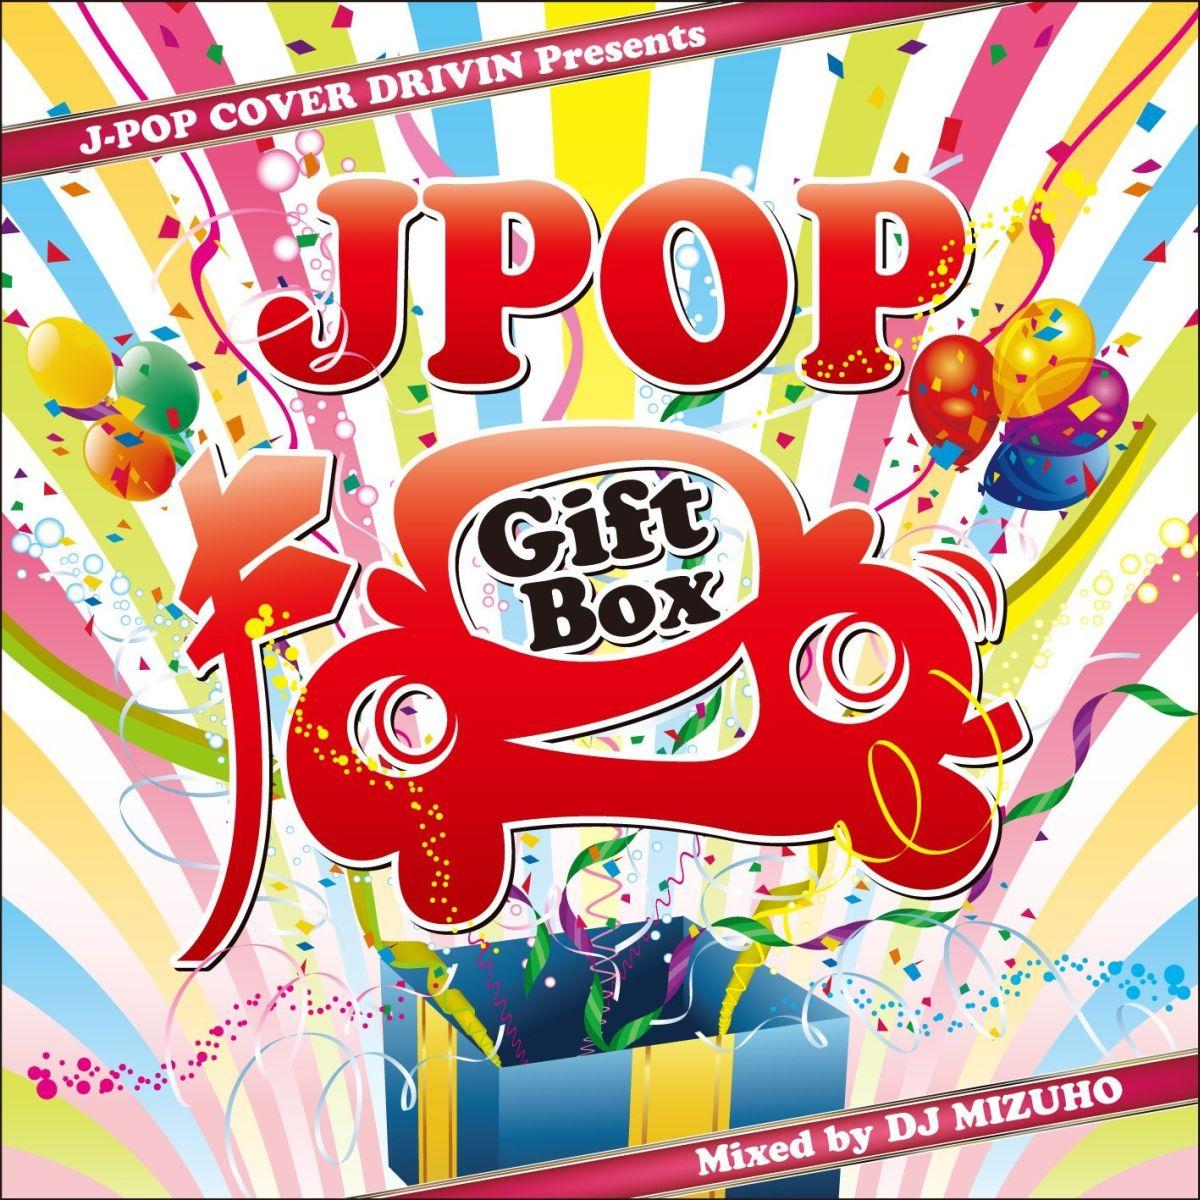 J-POP Cover Drivin presents GiftBox mixed by DJ MIZUHO画像